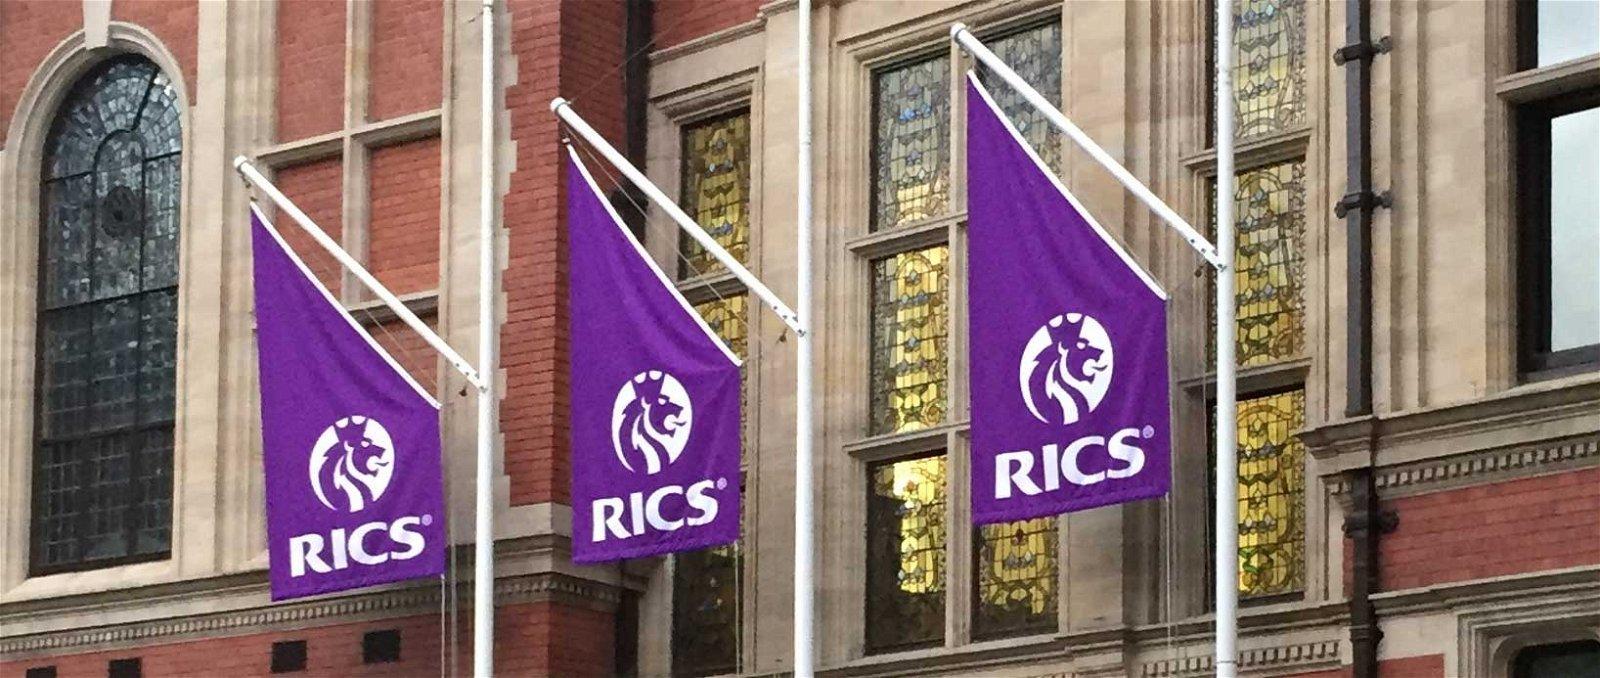 RICS - property management software